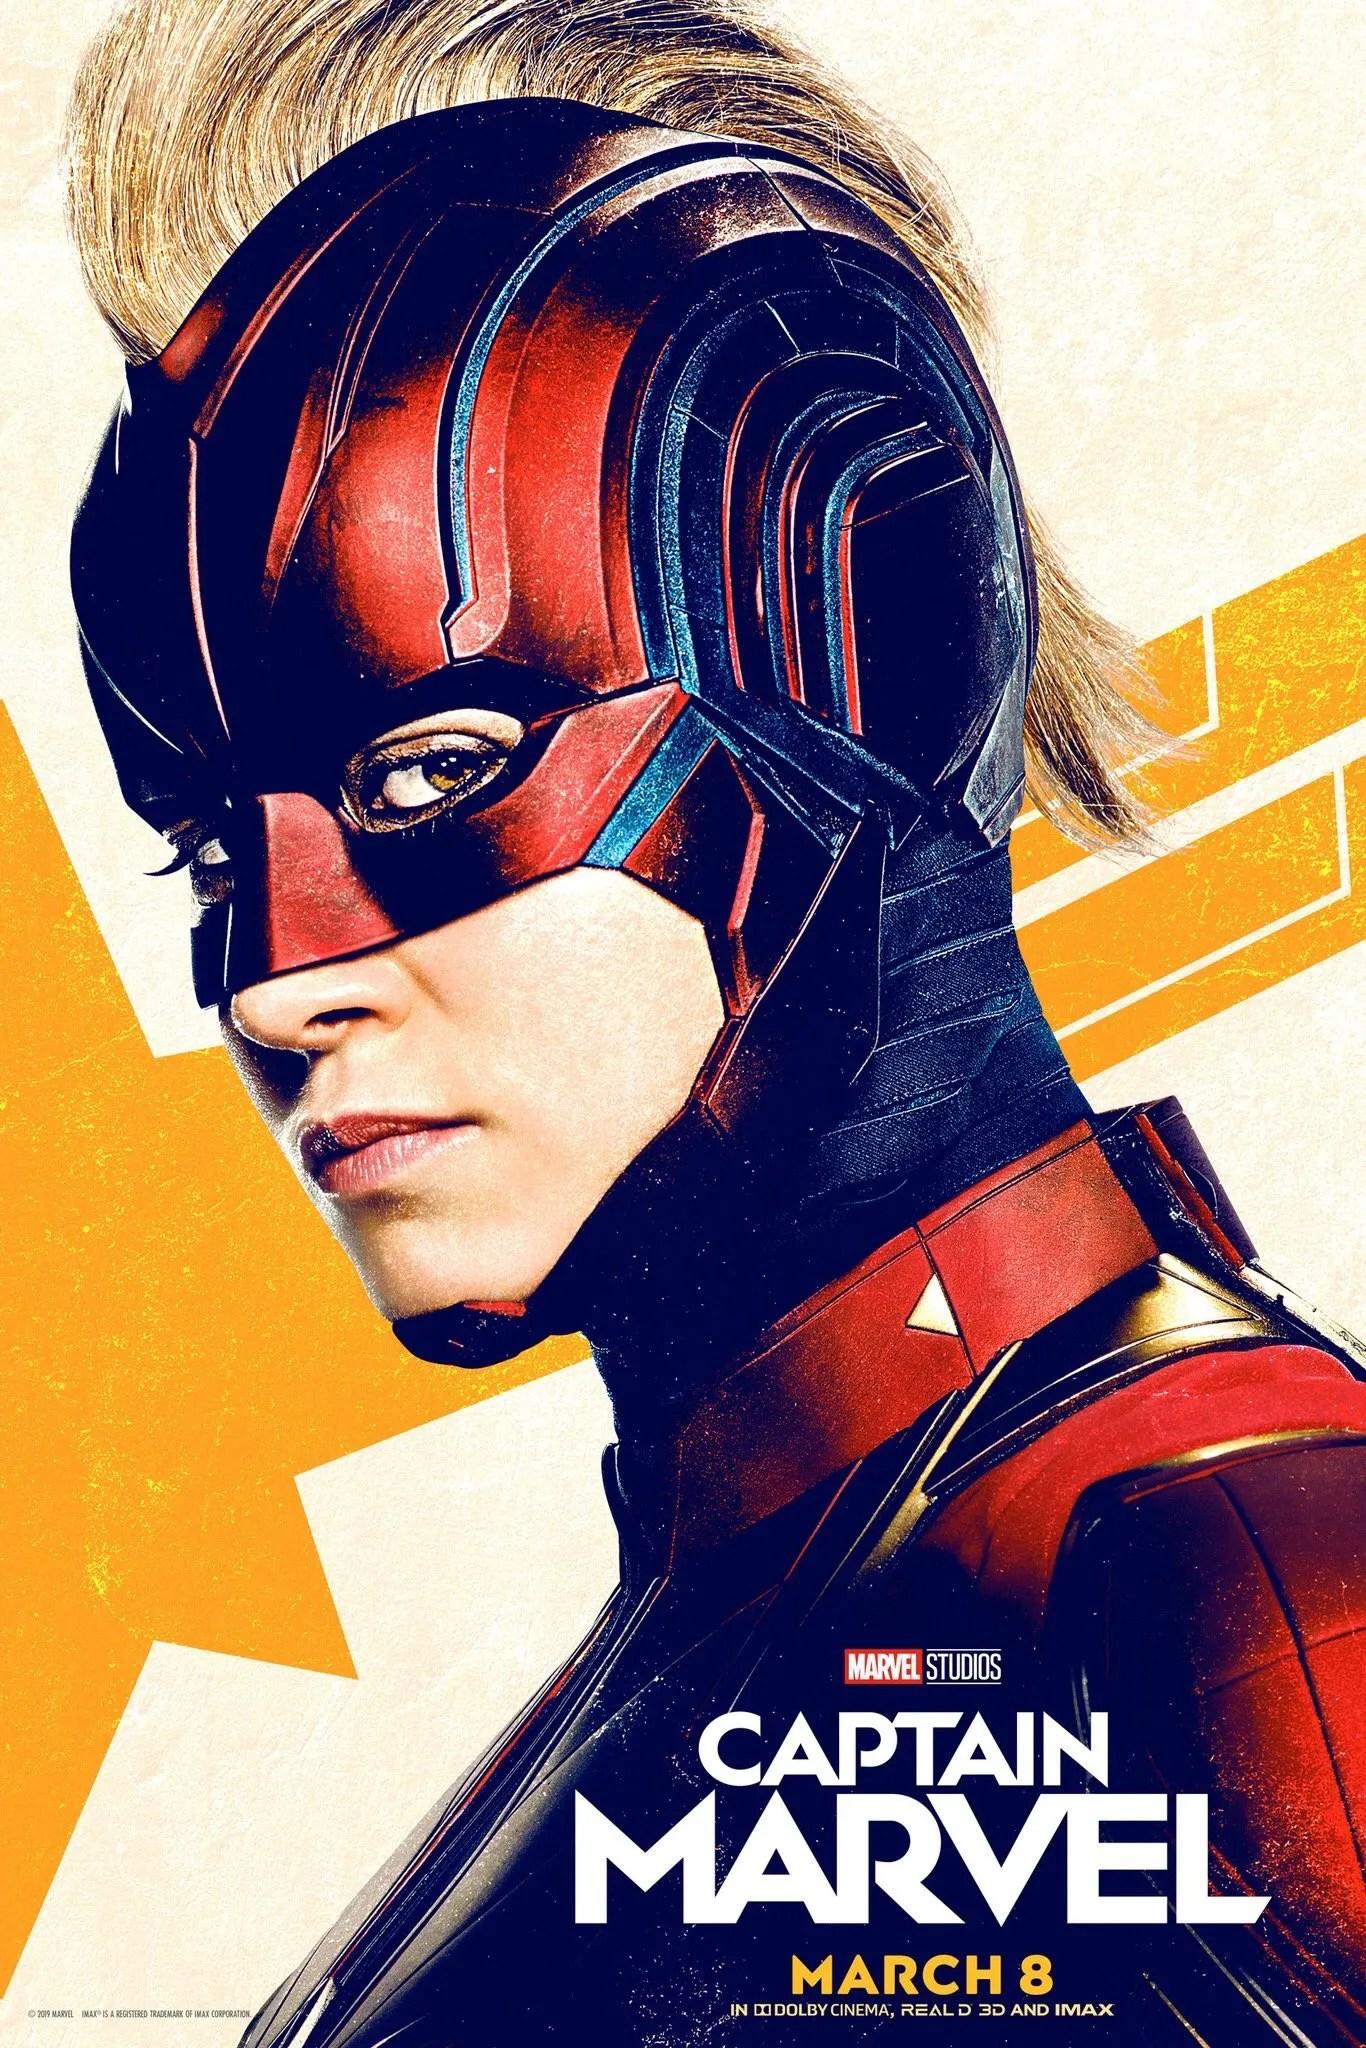 Nonton Captain Marvel Full Movie : nonton, captain, marvel, movie, Nonton, Captain, Marvel, Datingfasr